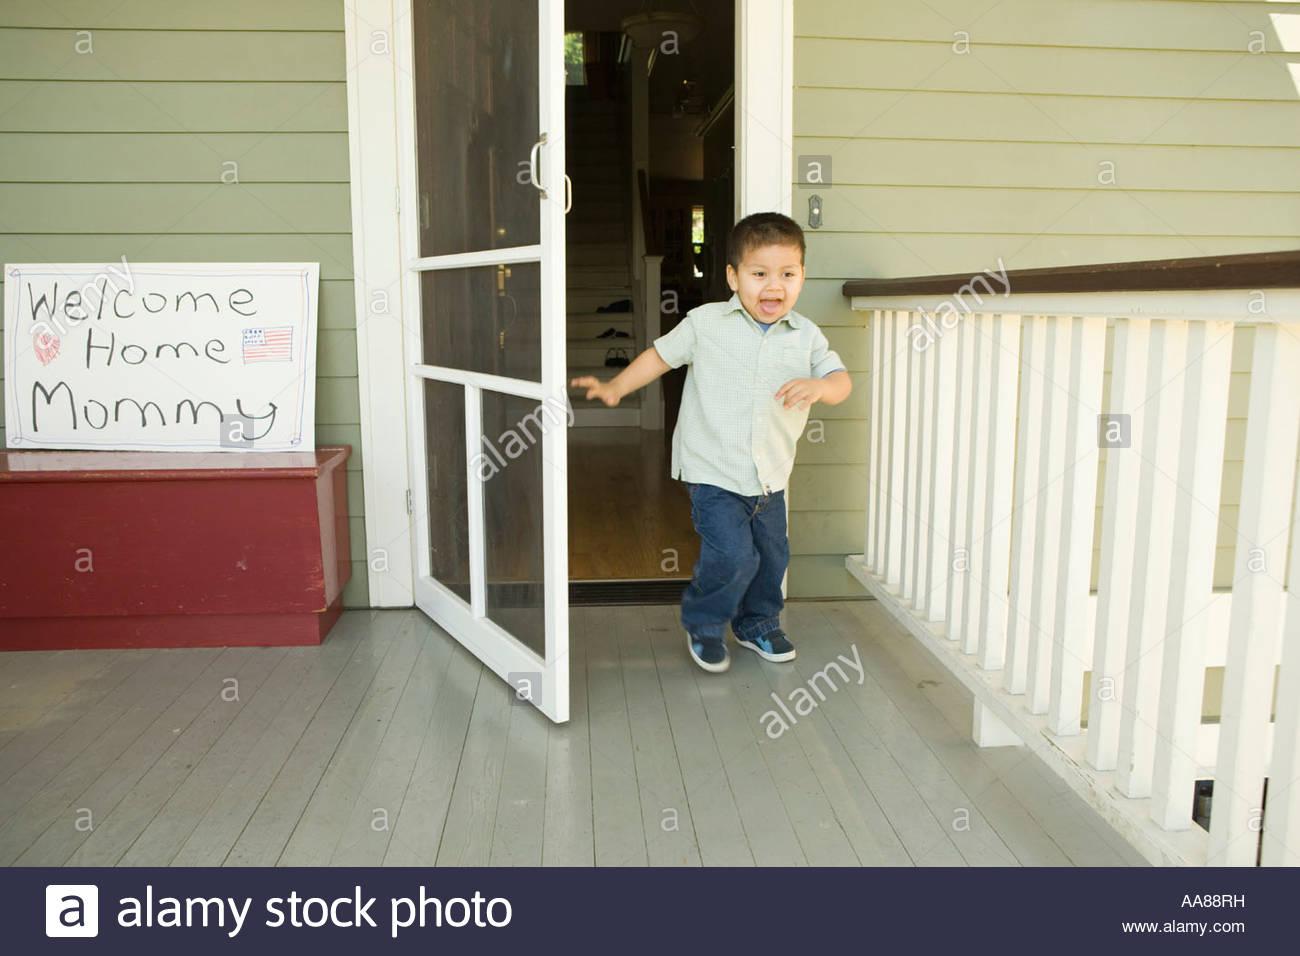 Hispanic boy running out front door  sc 1 st  Alamy & Hispanic boy running out front door Stock Photo: 12546964 - Alamy